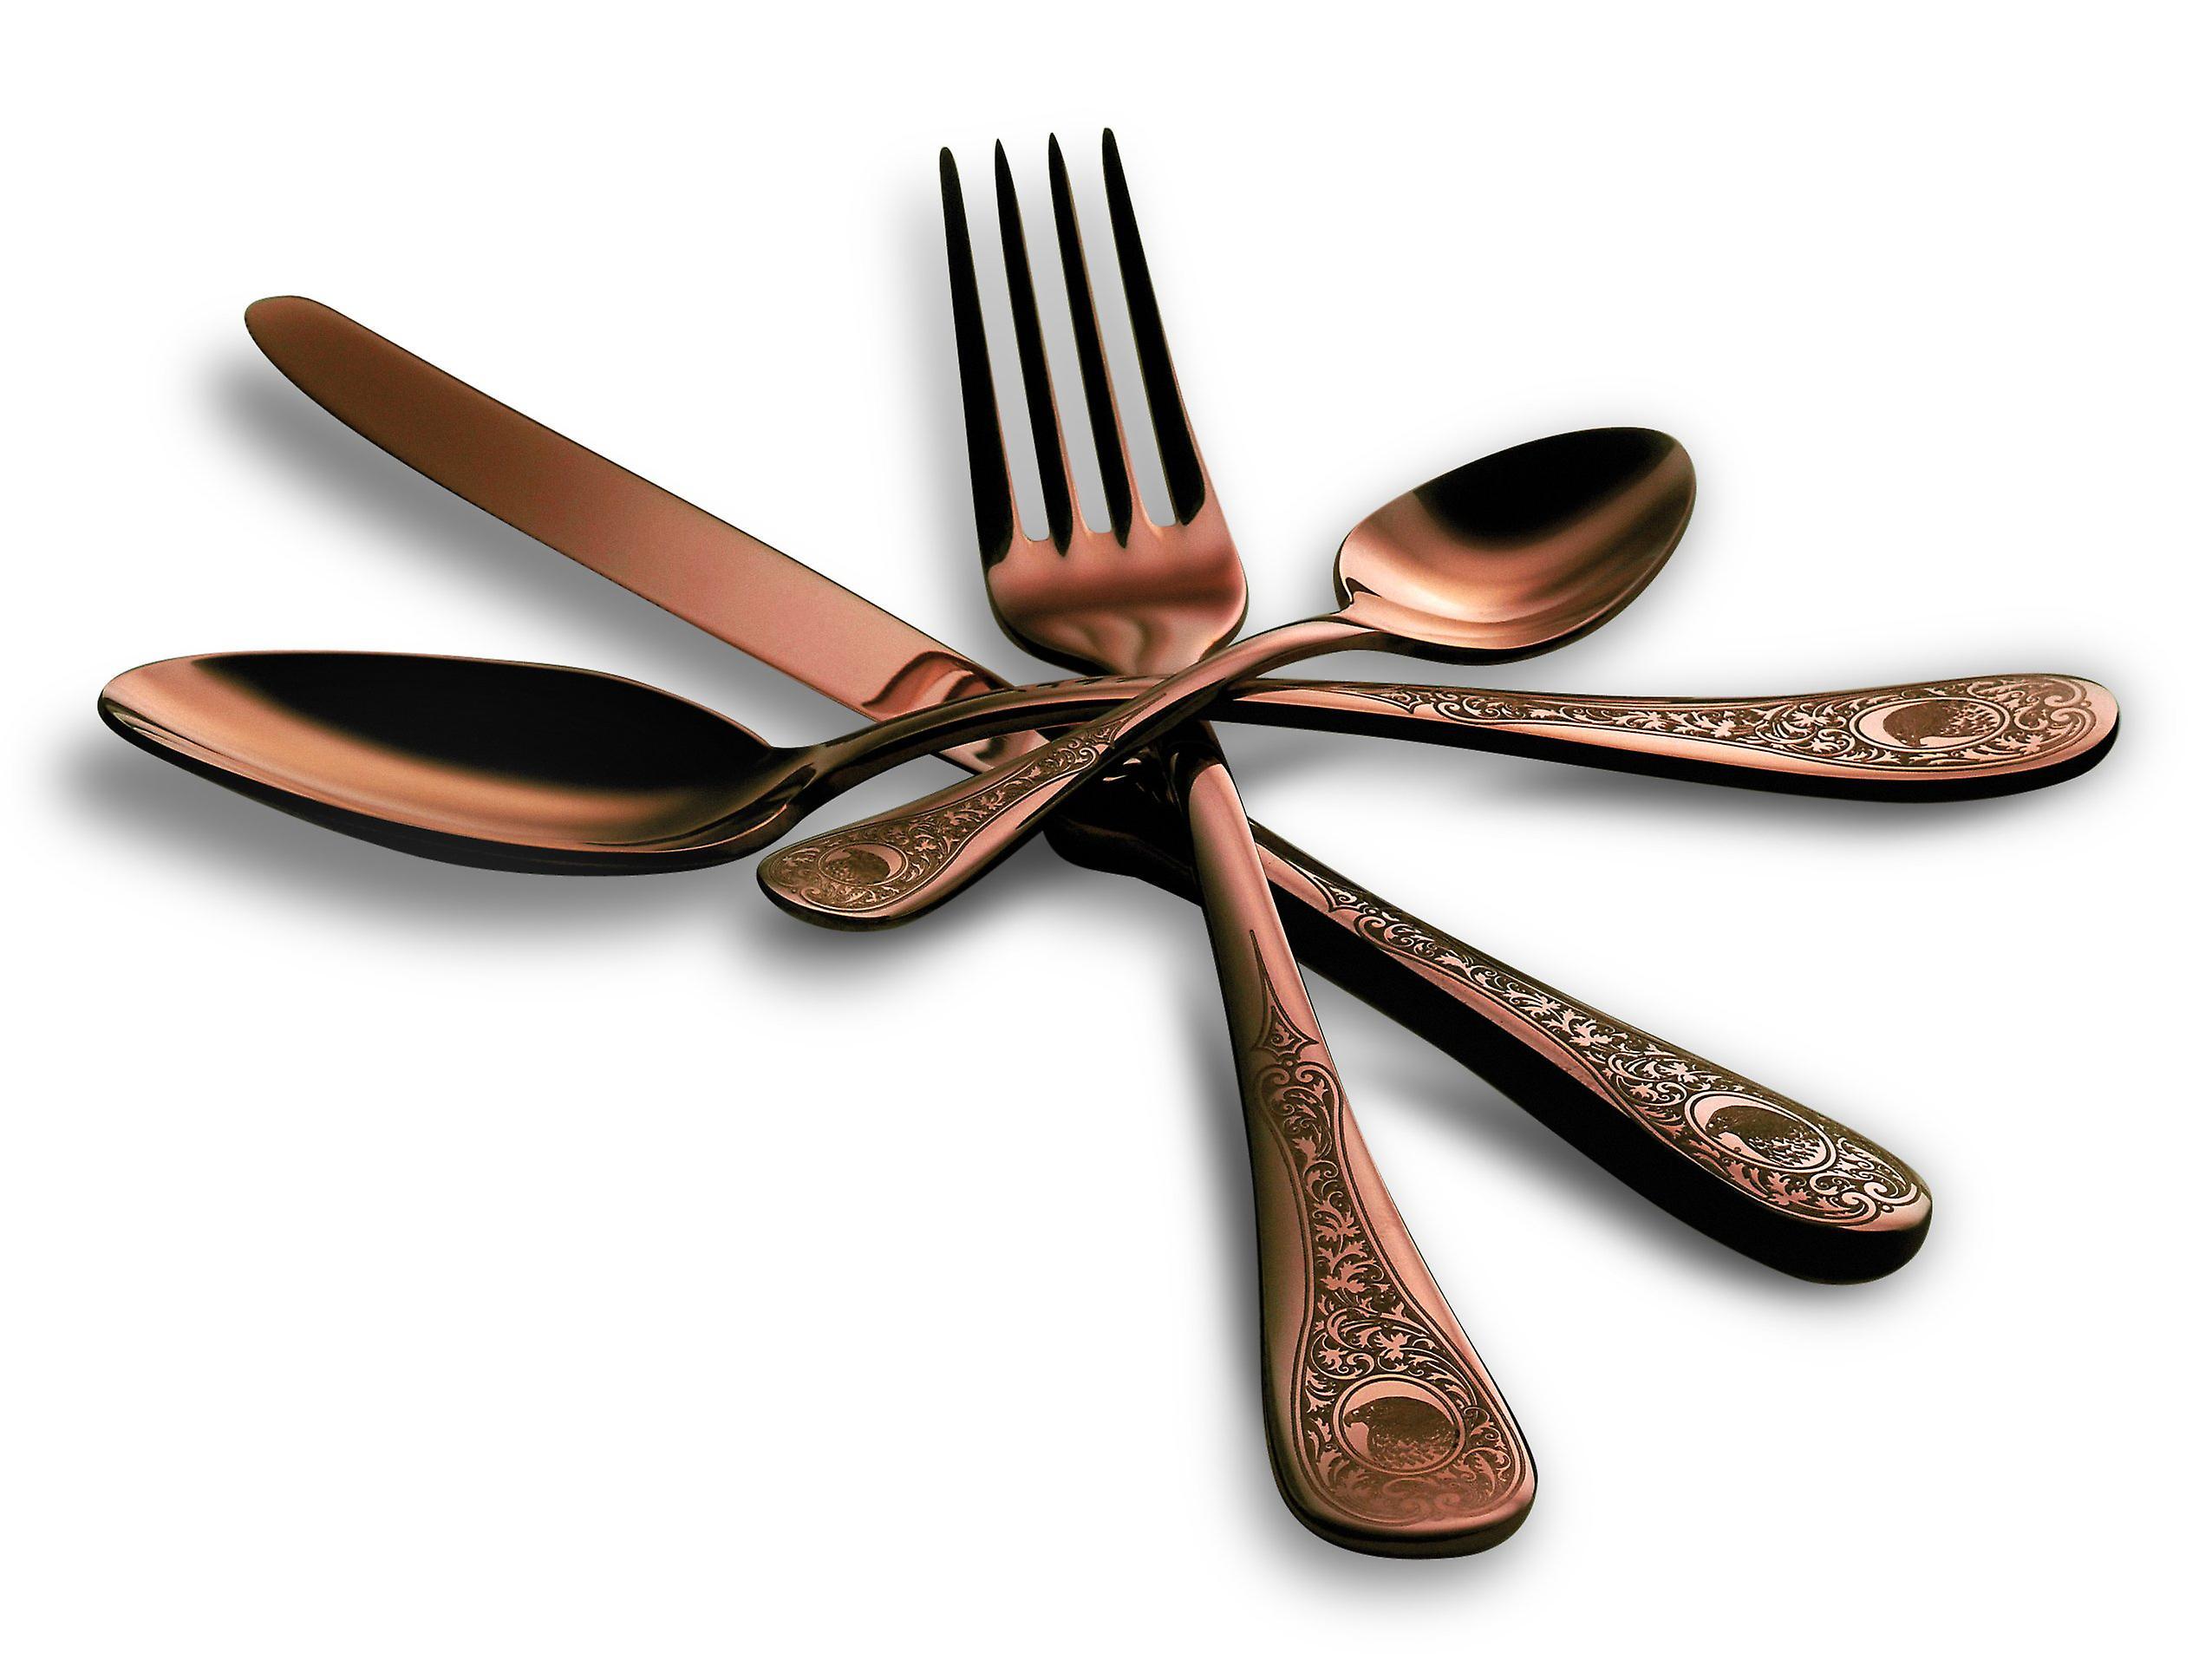 Mepra Diana Bronzo 4 pcs flatware set